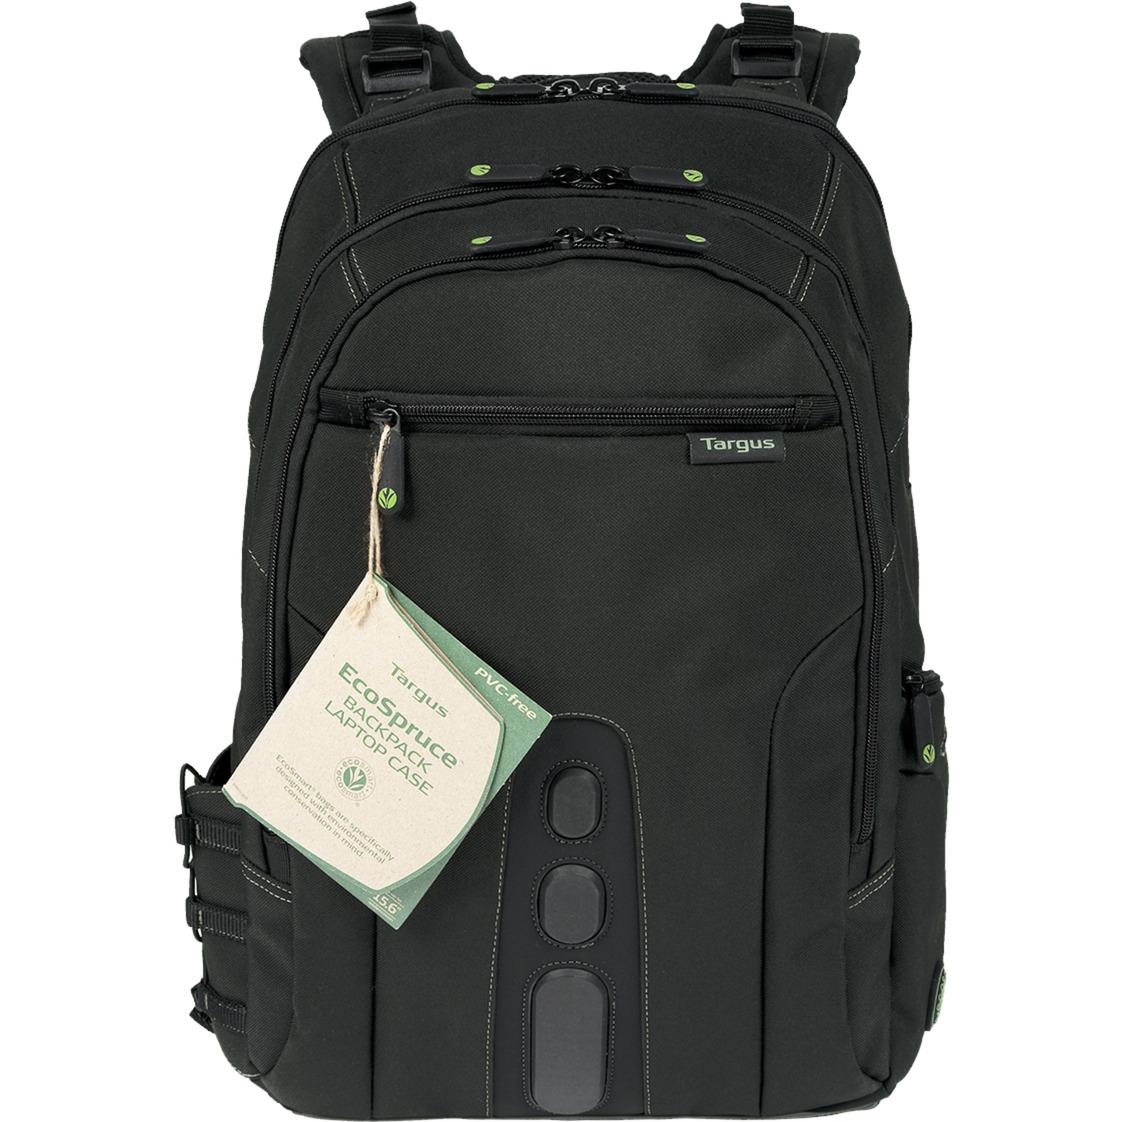 15.6 inch / 39.6cm EcoSpruce Backpack, Mochila